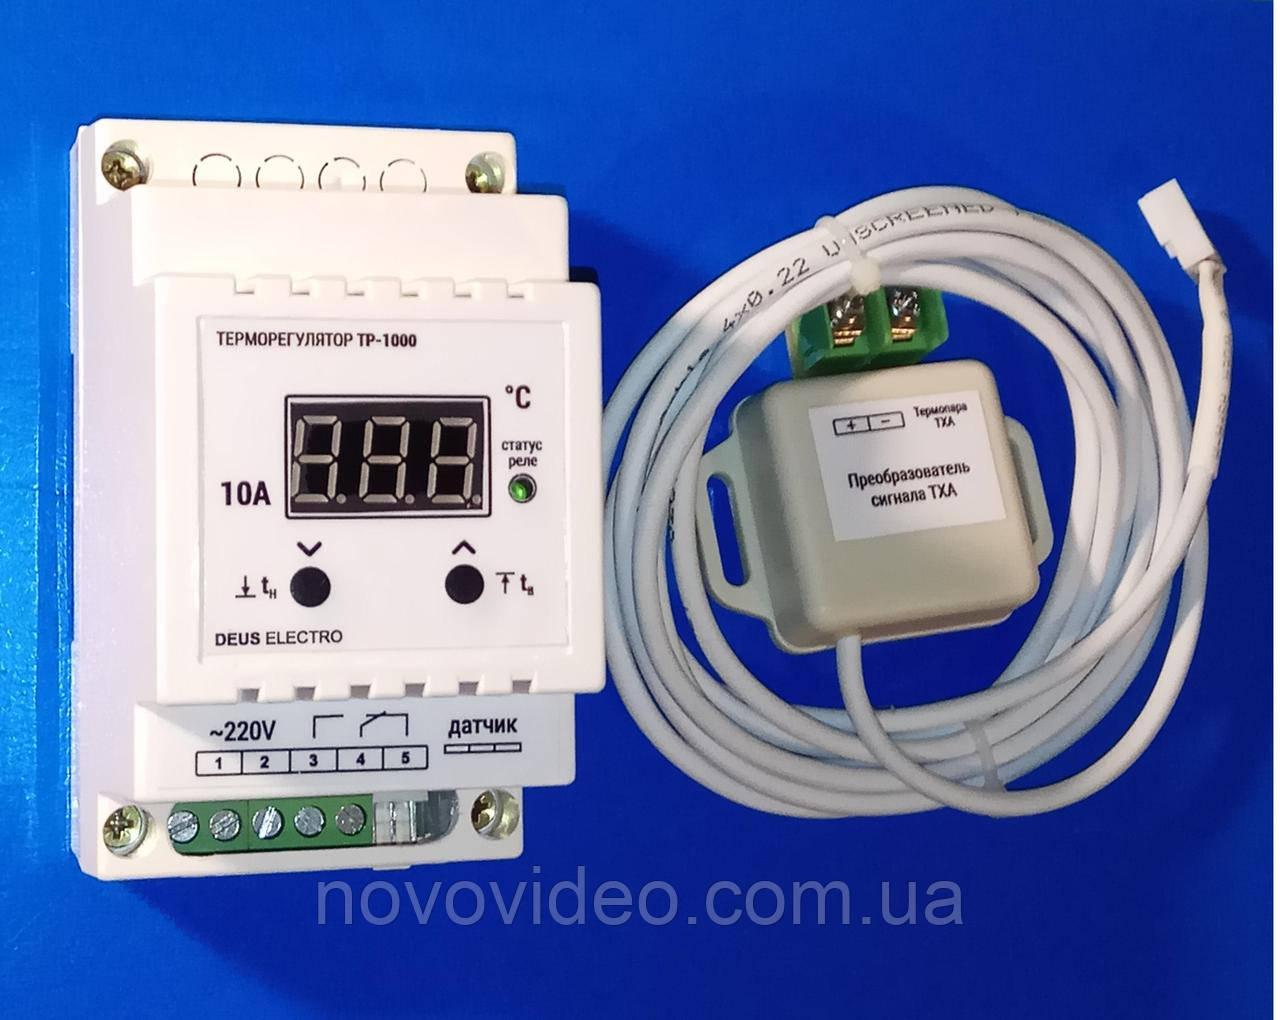 Терморегулятор для высоких температур с термопарой ТР-1000  на 10 А, 999°C